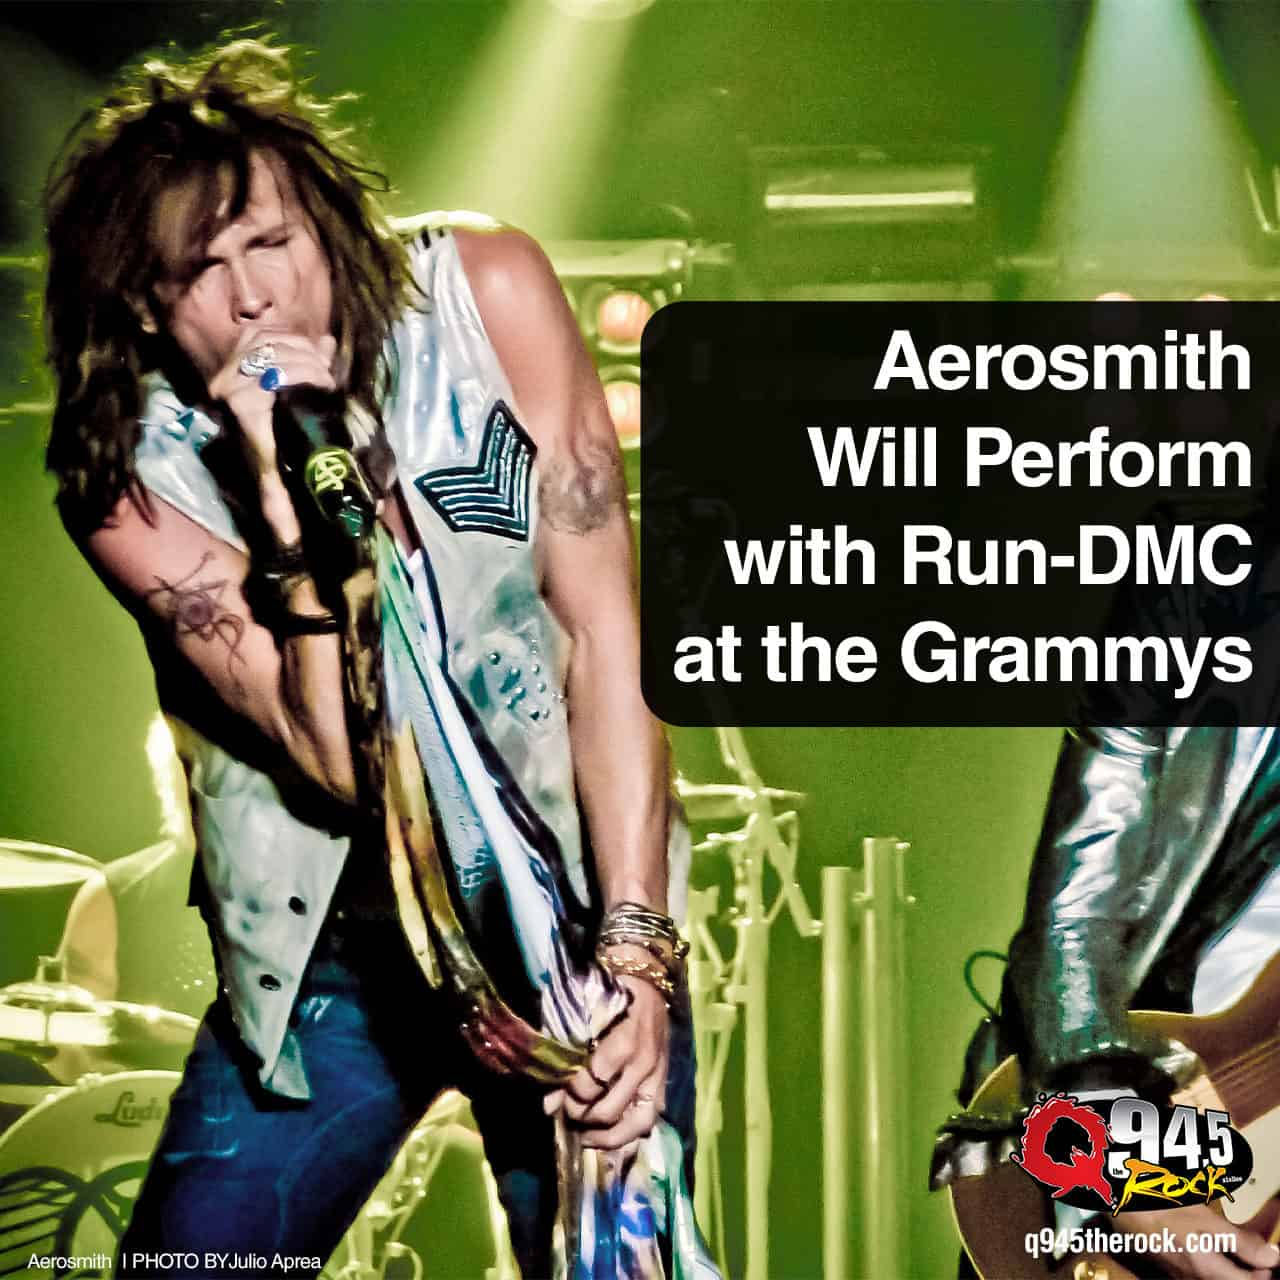 Aerosmith Will Perform with Run-DMC at the Grammys -  KFRQ Q94.5